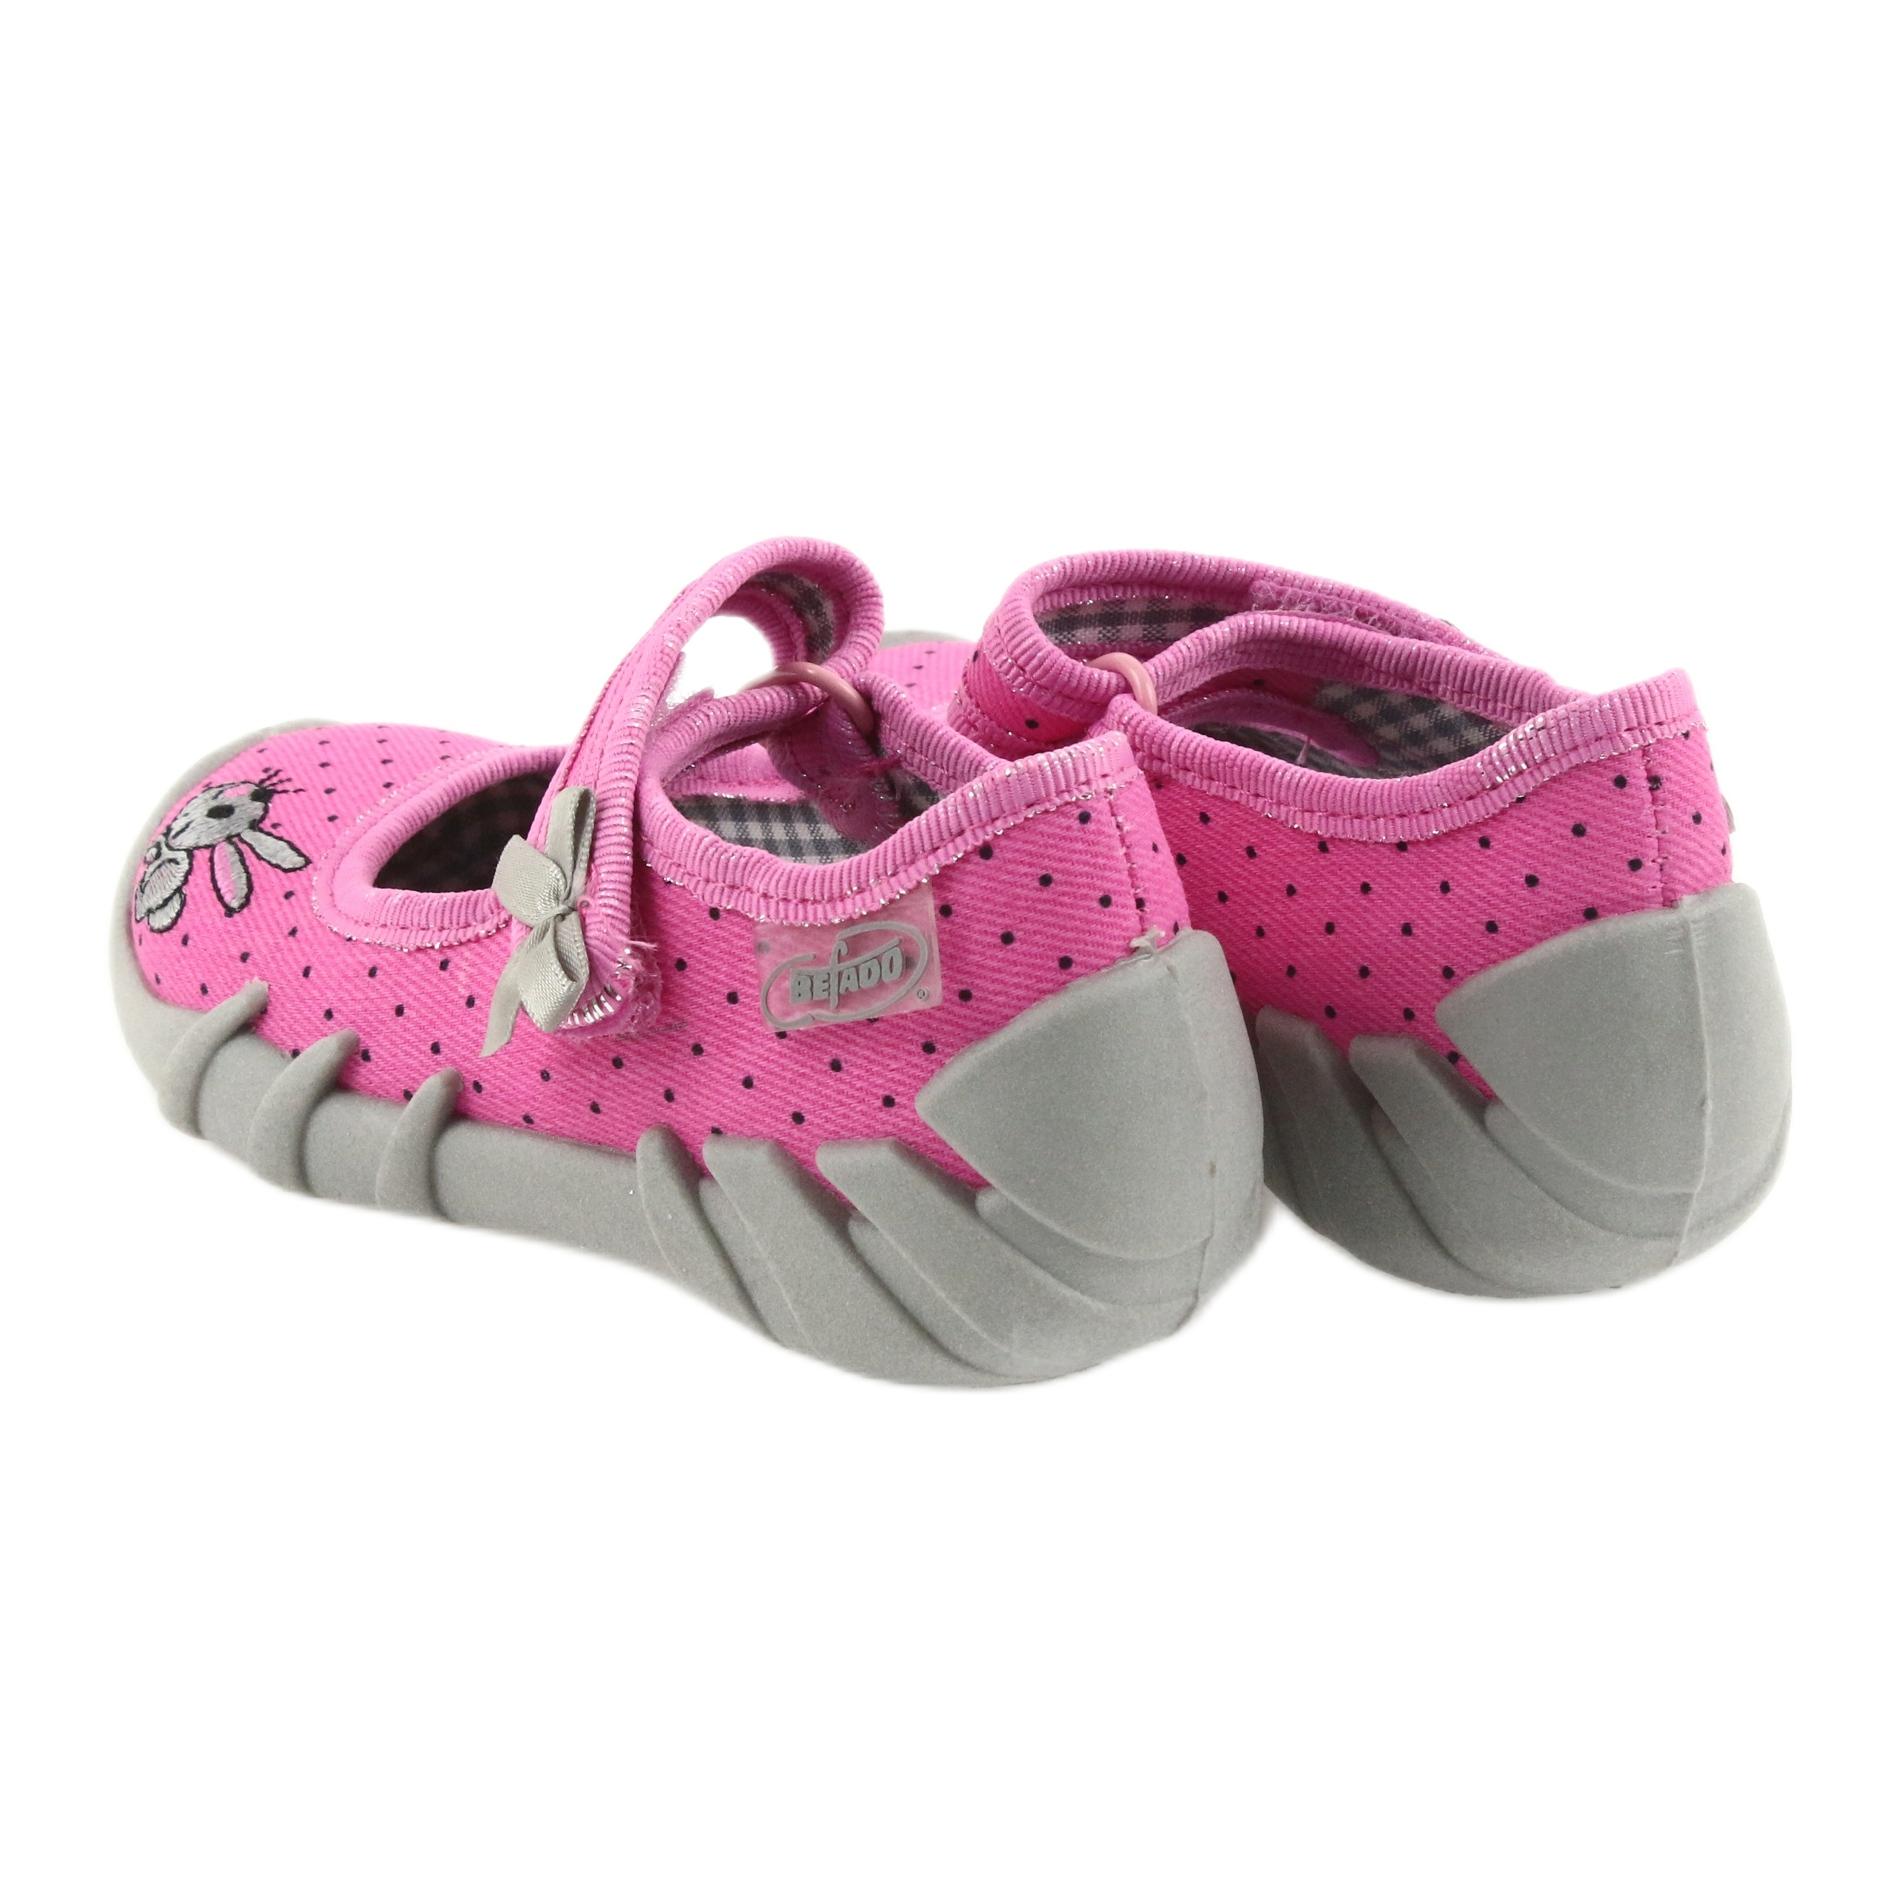 miniatura 5 - Pantofole da ballerina Befado per bambini 109P169 nero grigio rosa